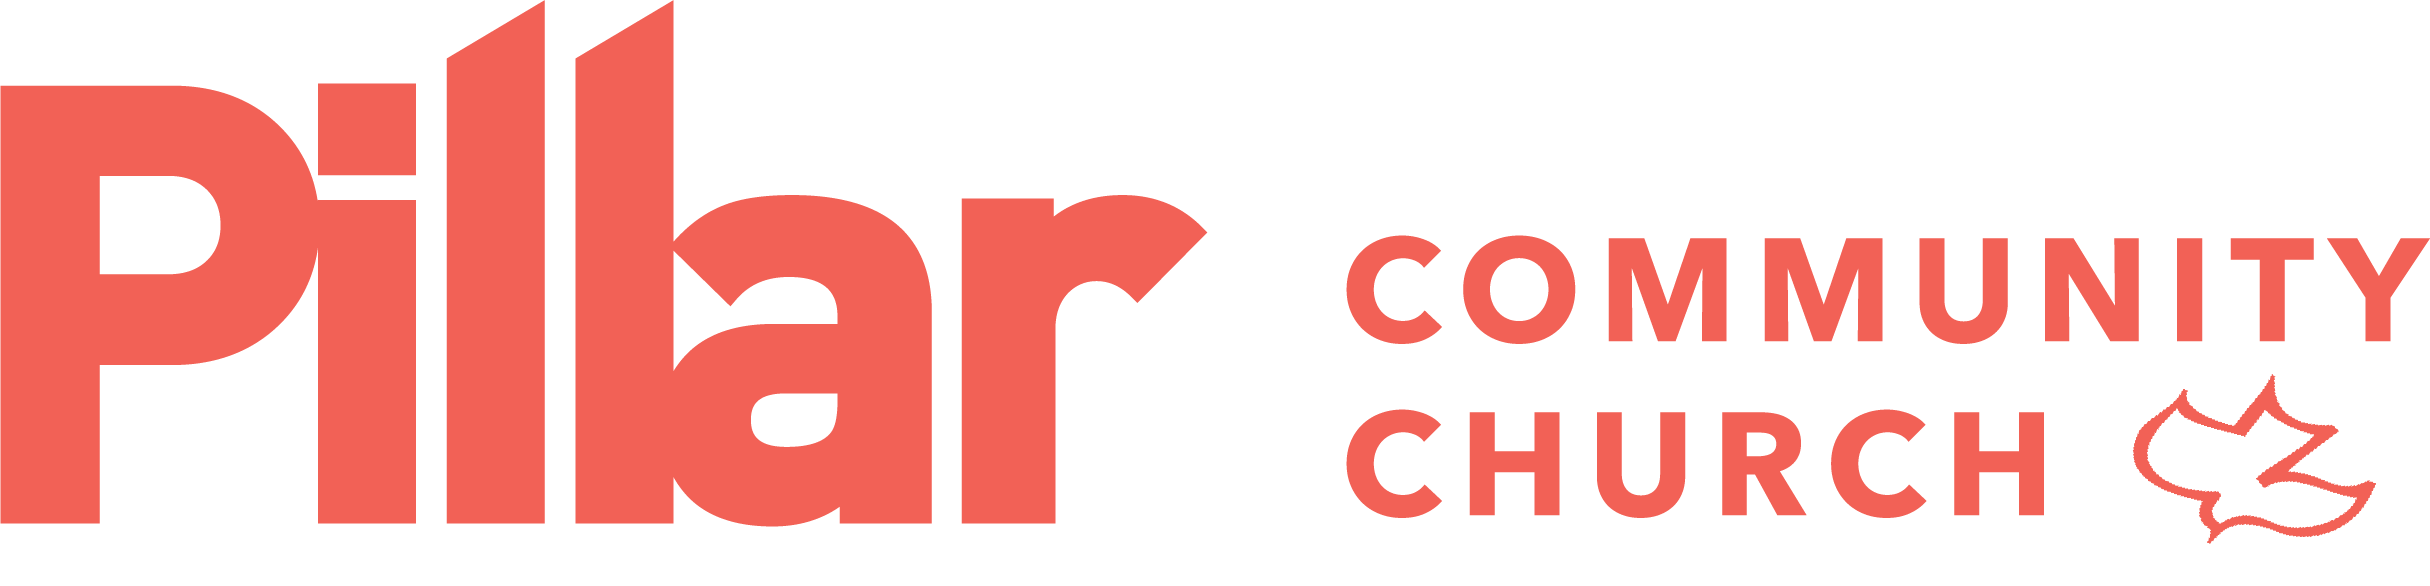 Pillar Community Church | Sermons